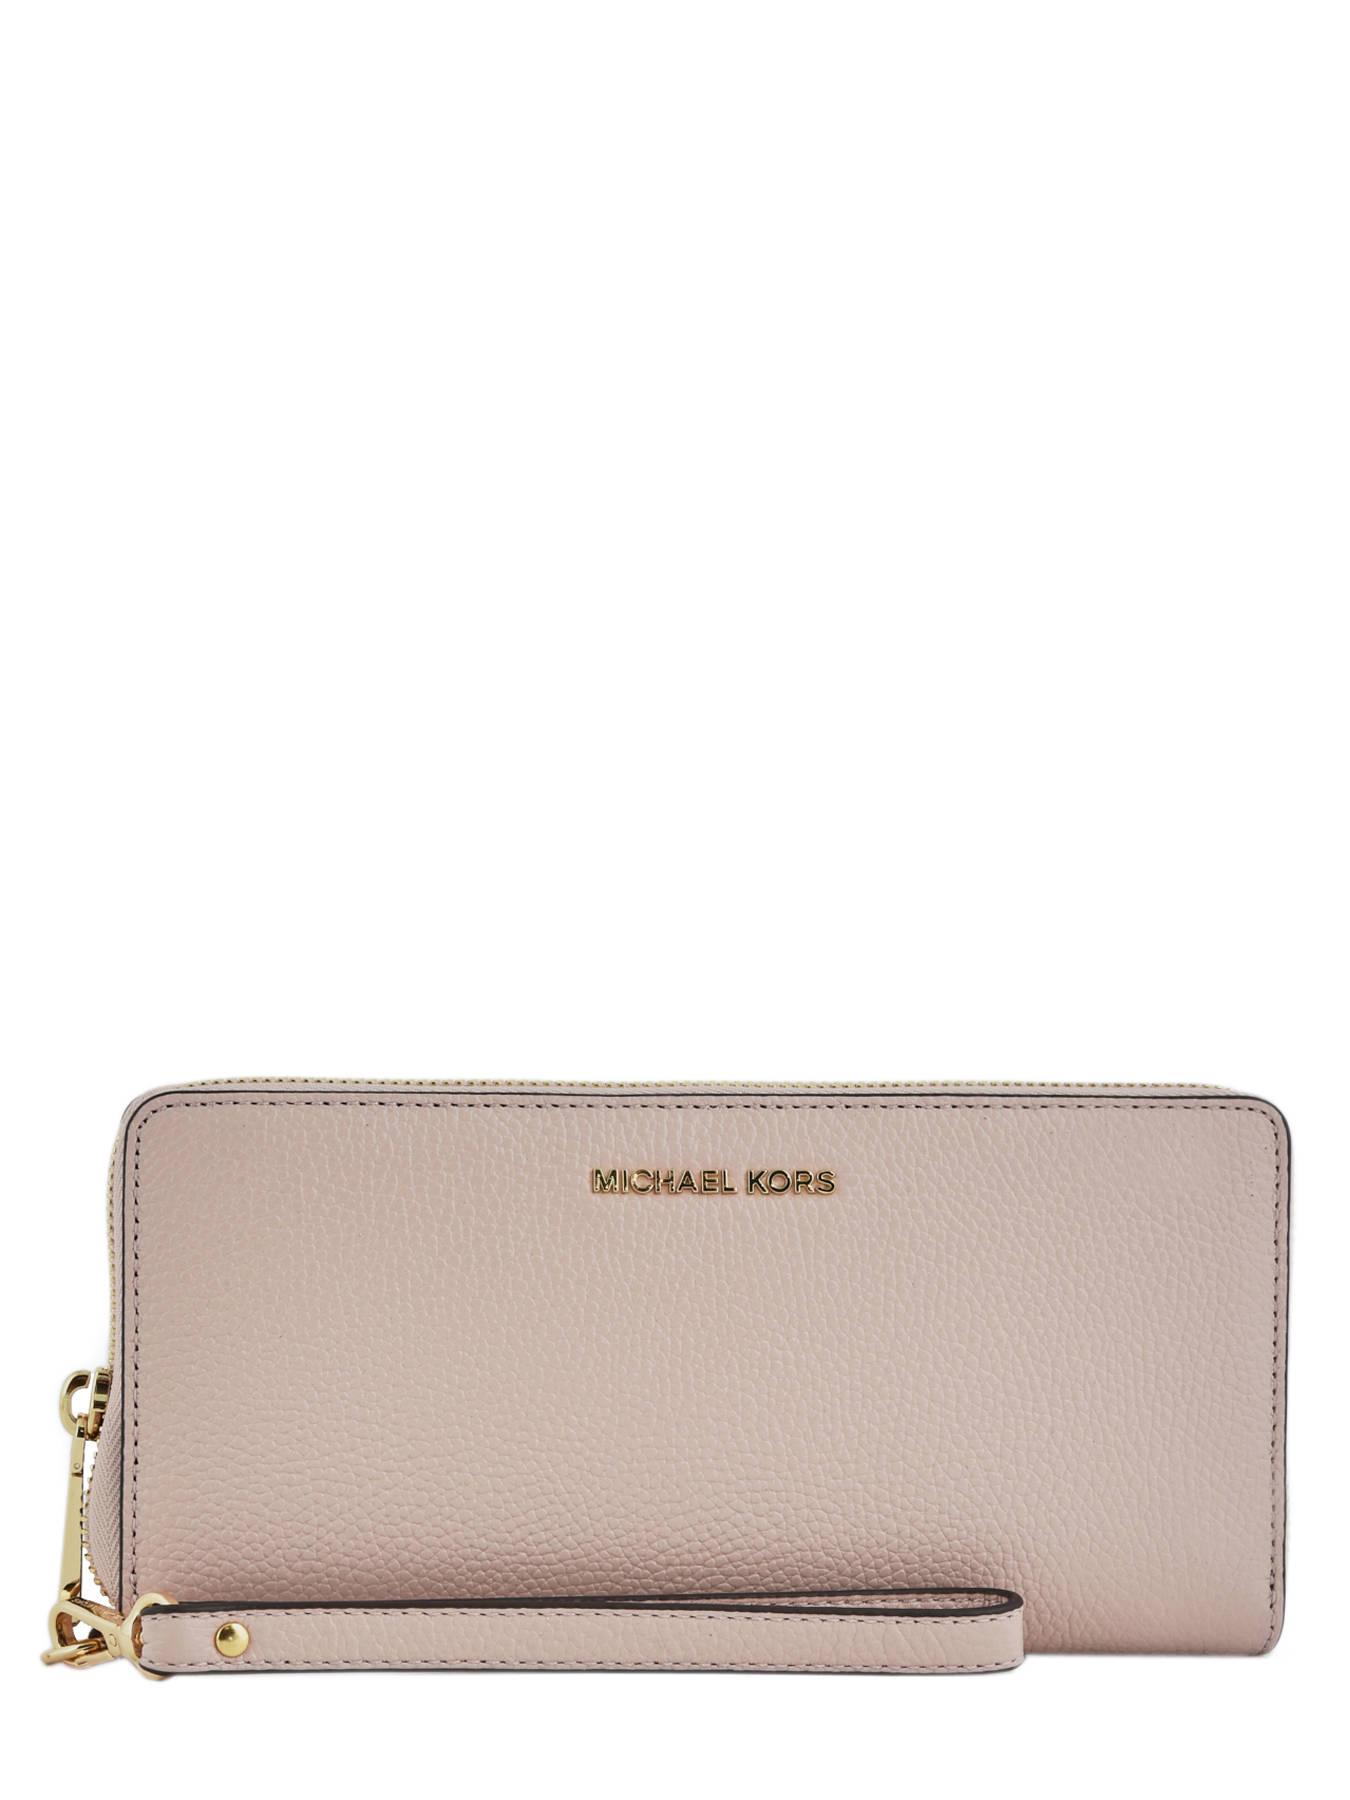 ab440860c4a3 ... Continental Wallet Leather Michael kors Pink money pieces F6GM9E9L ...